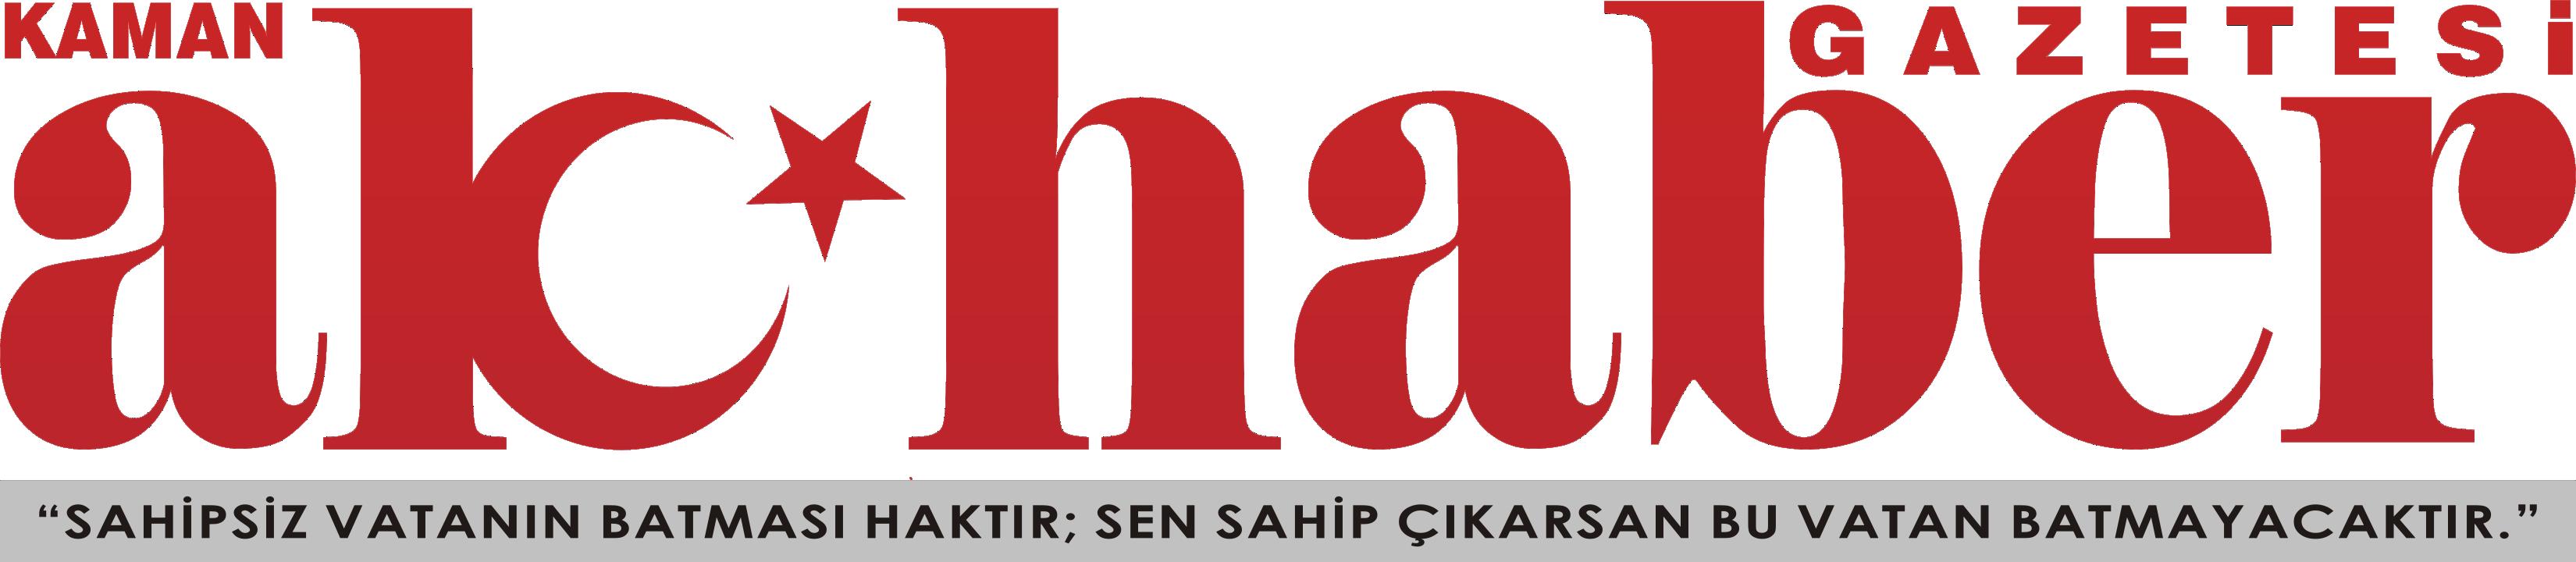 Kaman Ak Haber Gazetesi